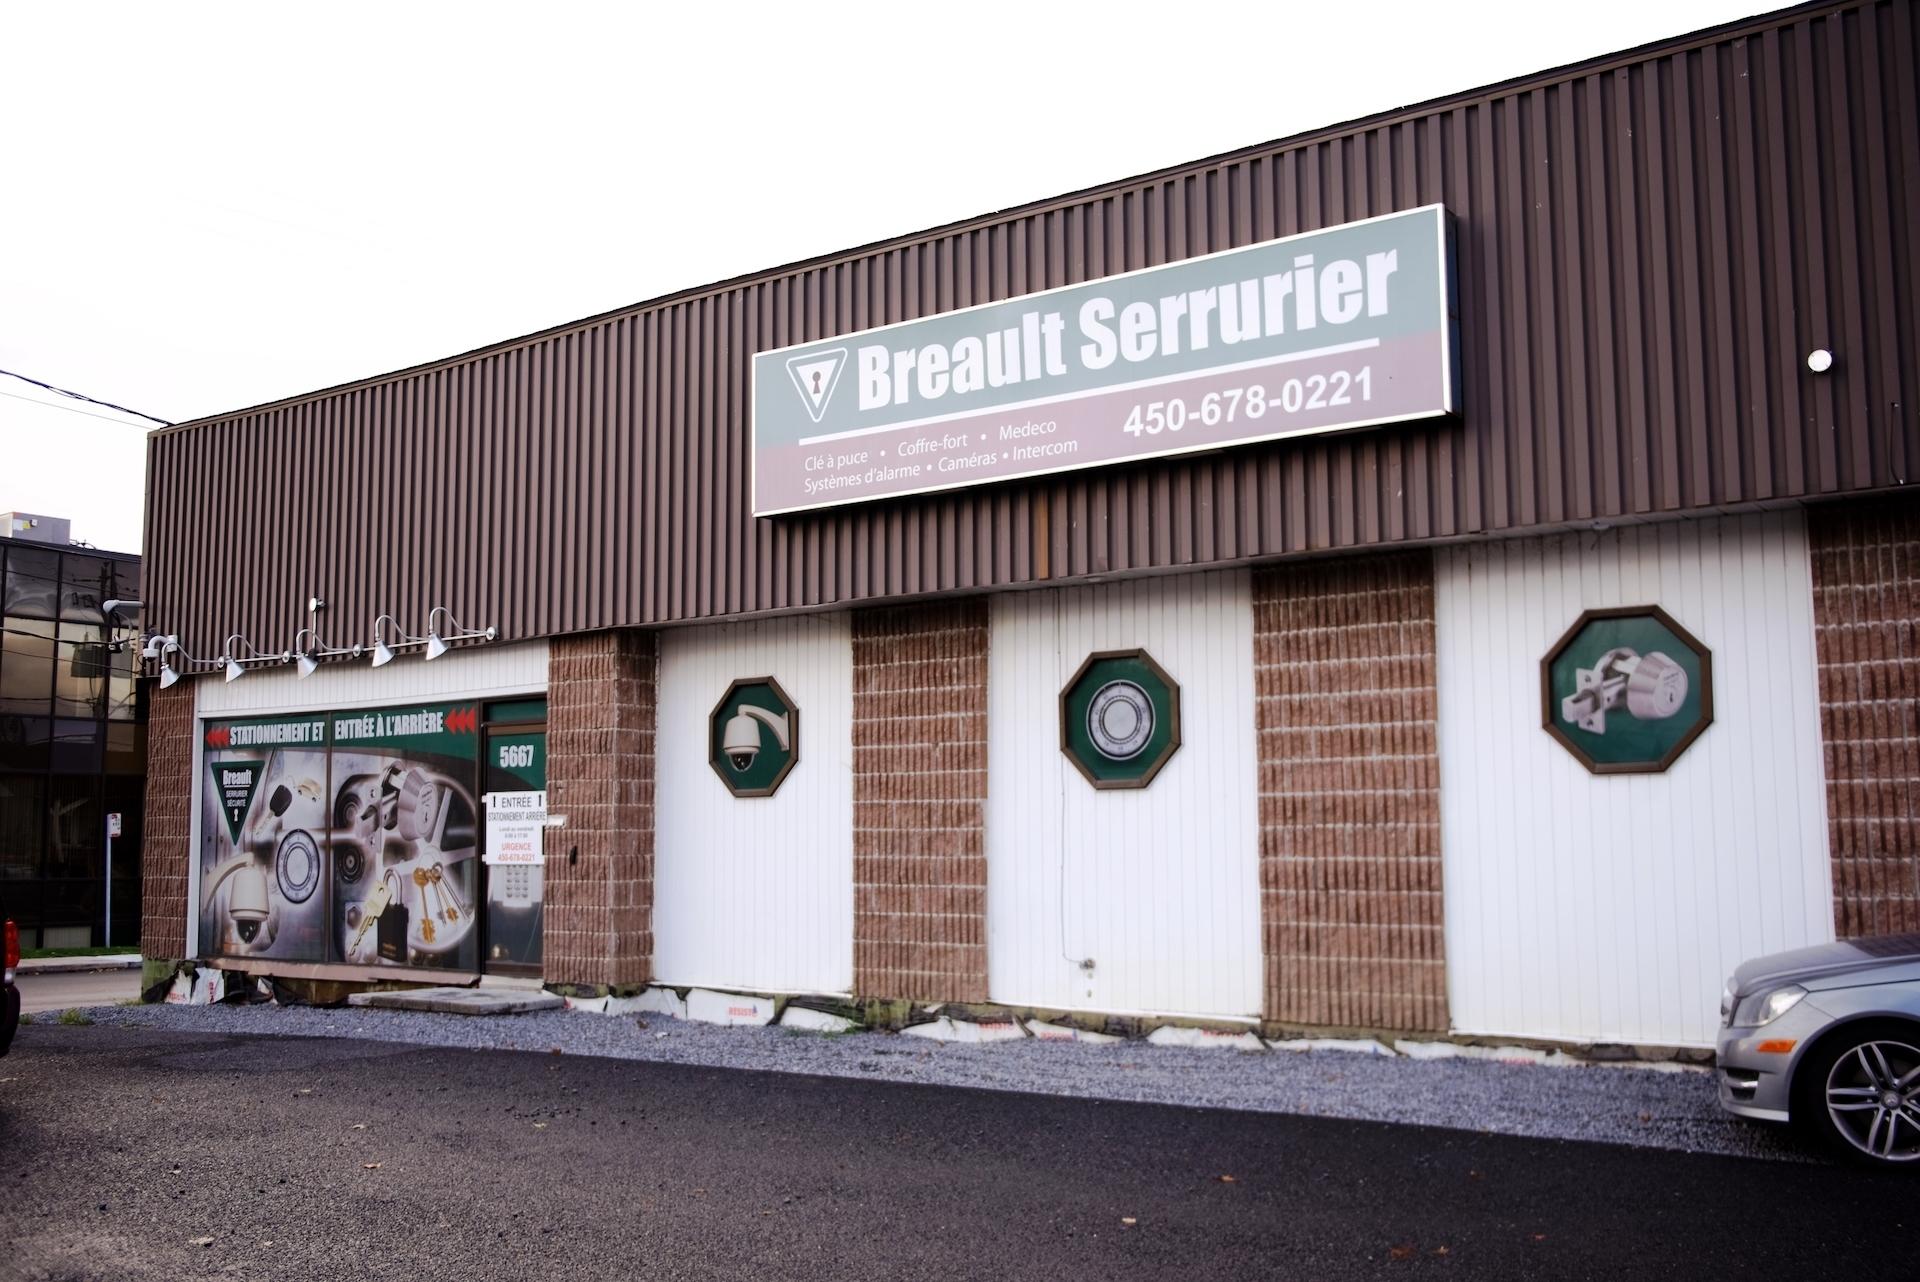 Breault Serrurier Sécurité in Saint-Hubert